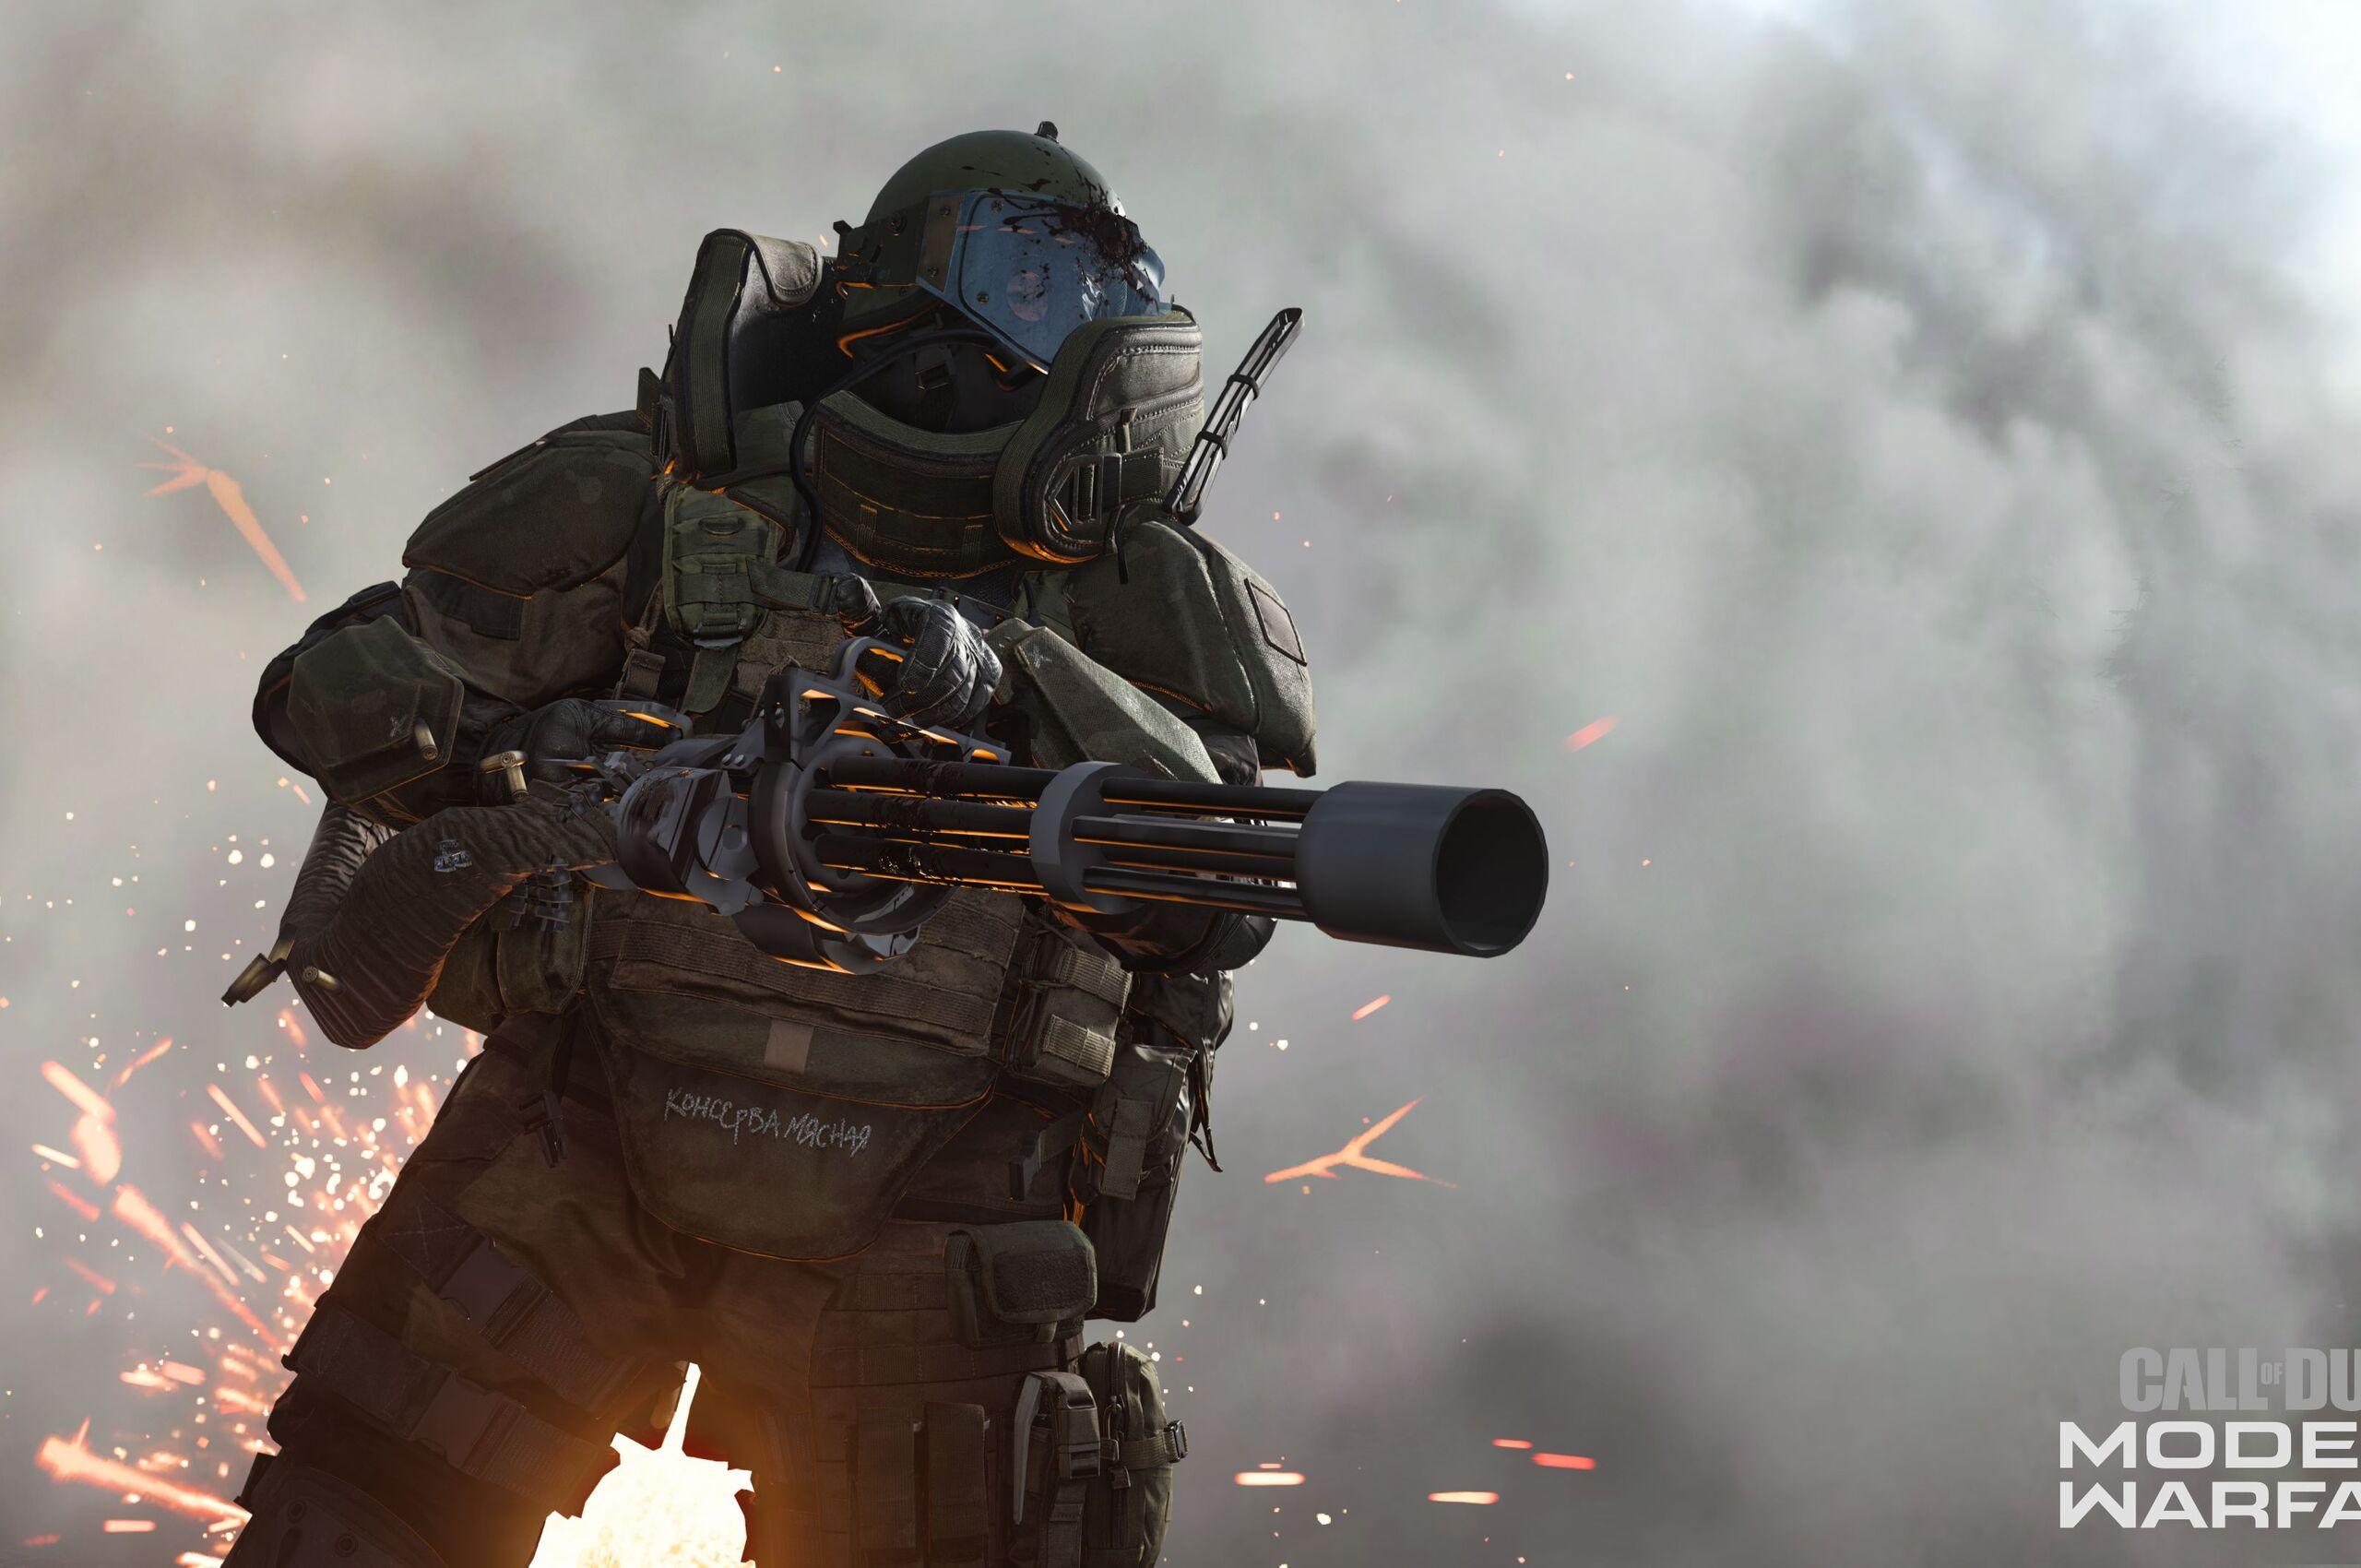 2560x1700 Call Of Duty Modern Warfare 4k 2019 Chromebook Pixel Hd